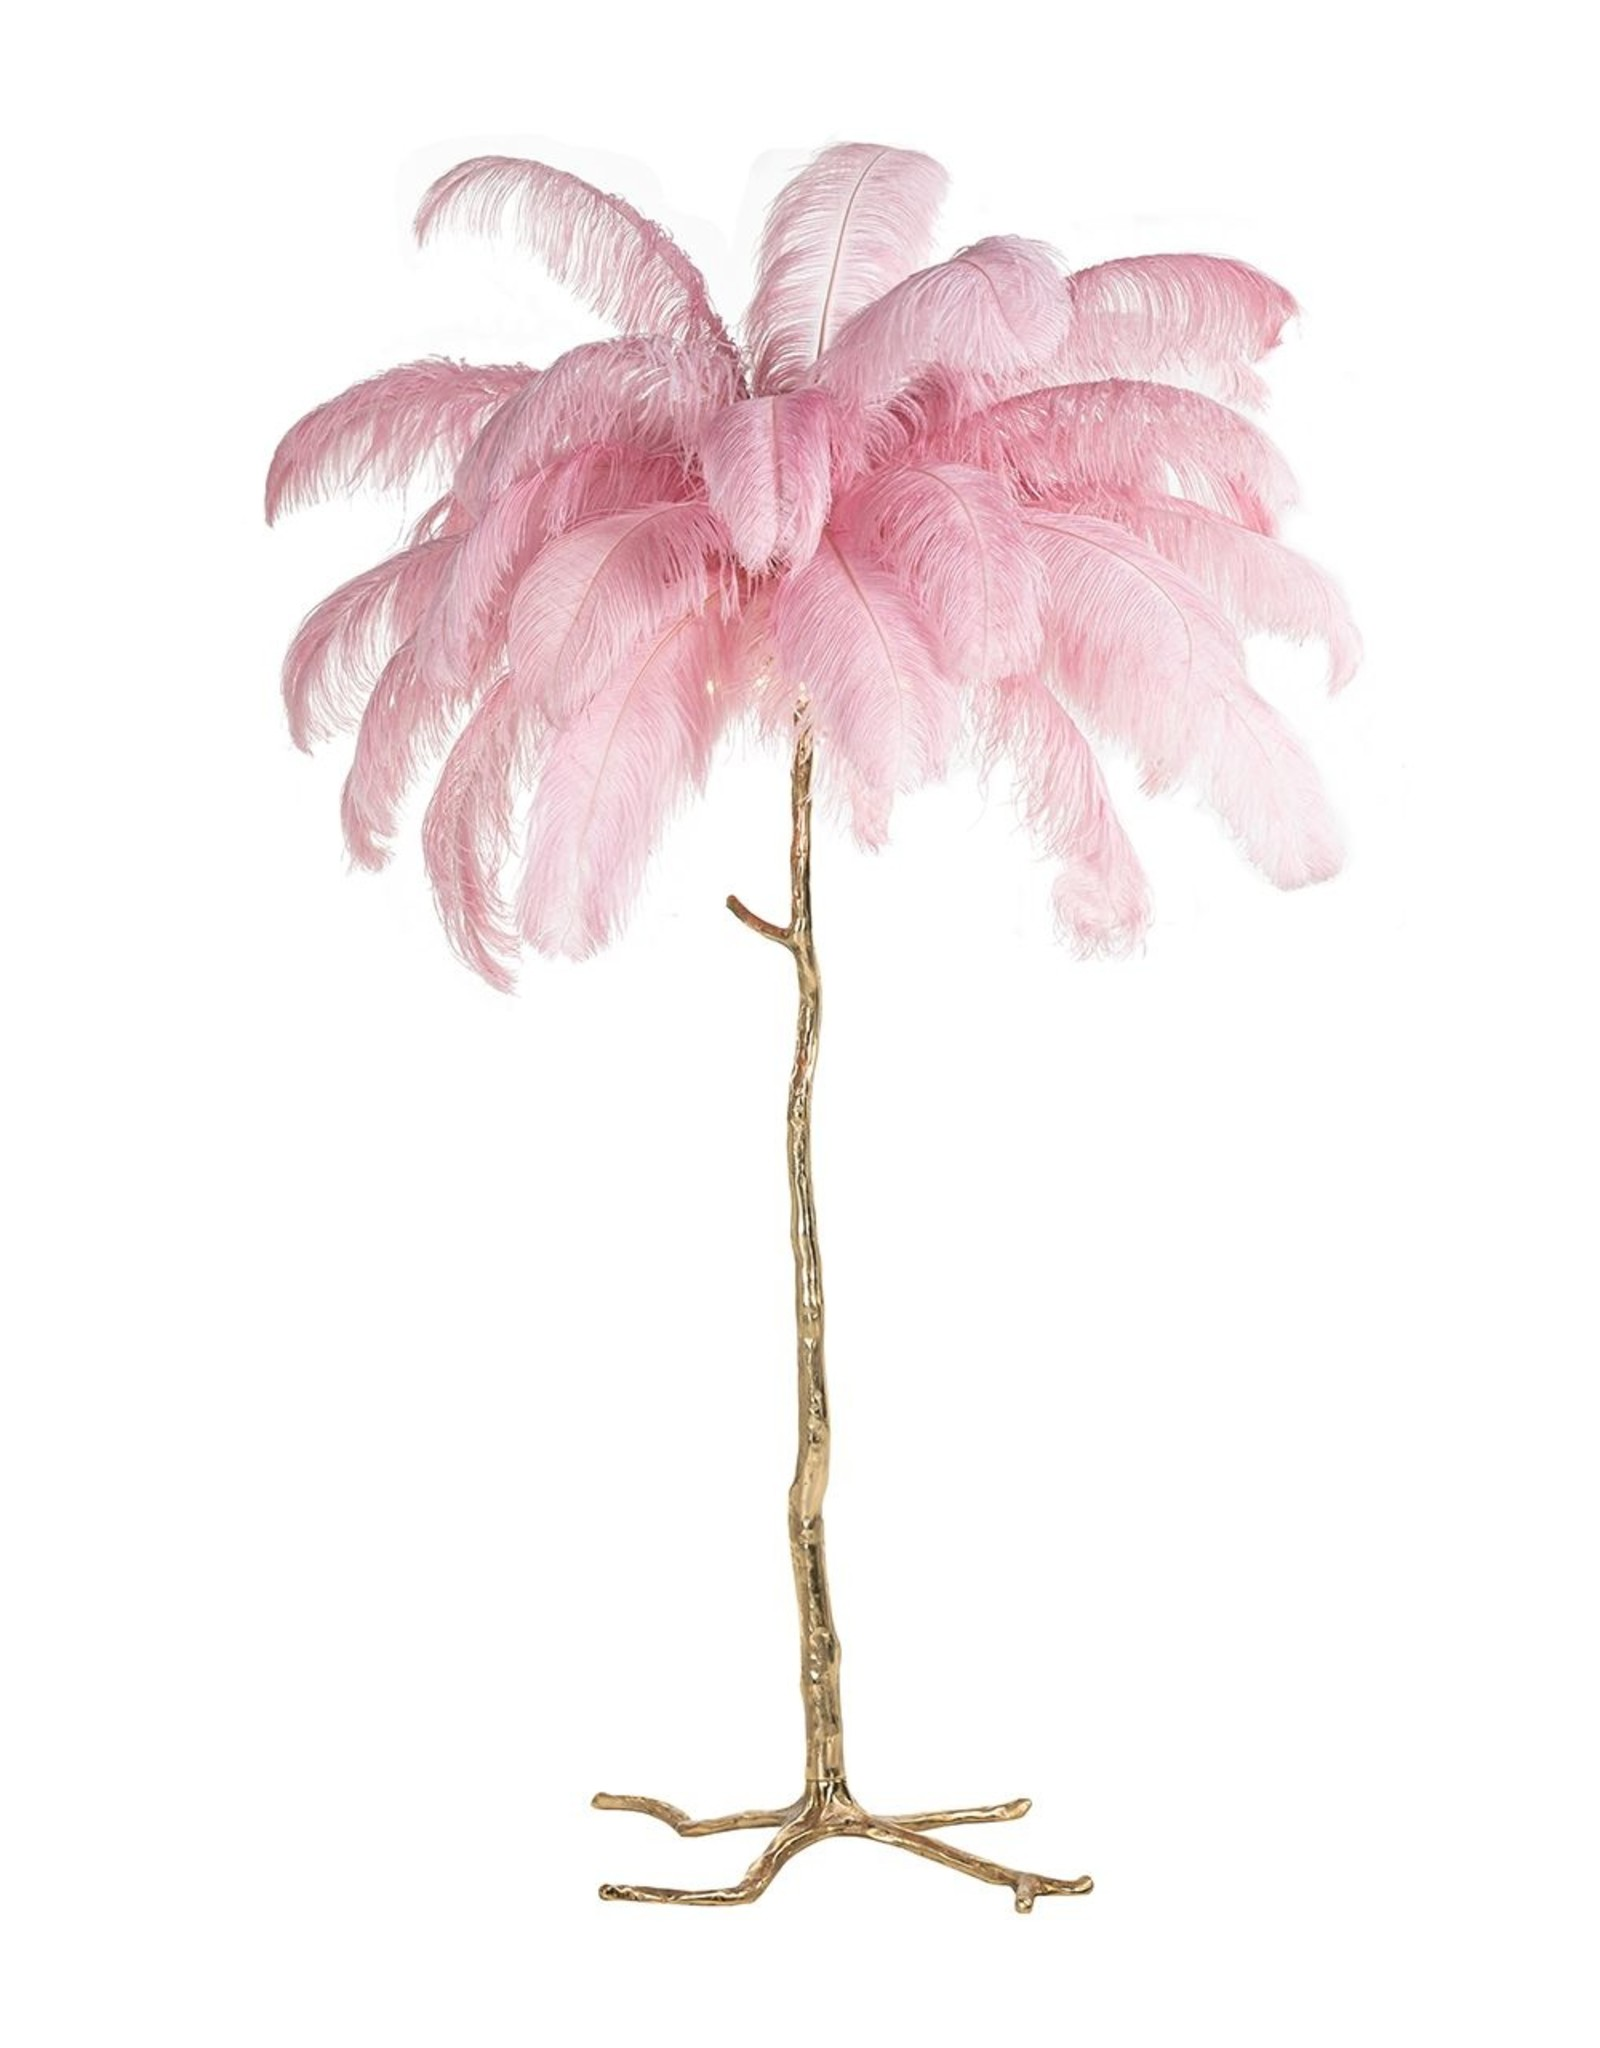 Richmond Interiors Vloerlamp Burlesque roze